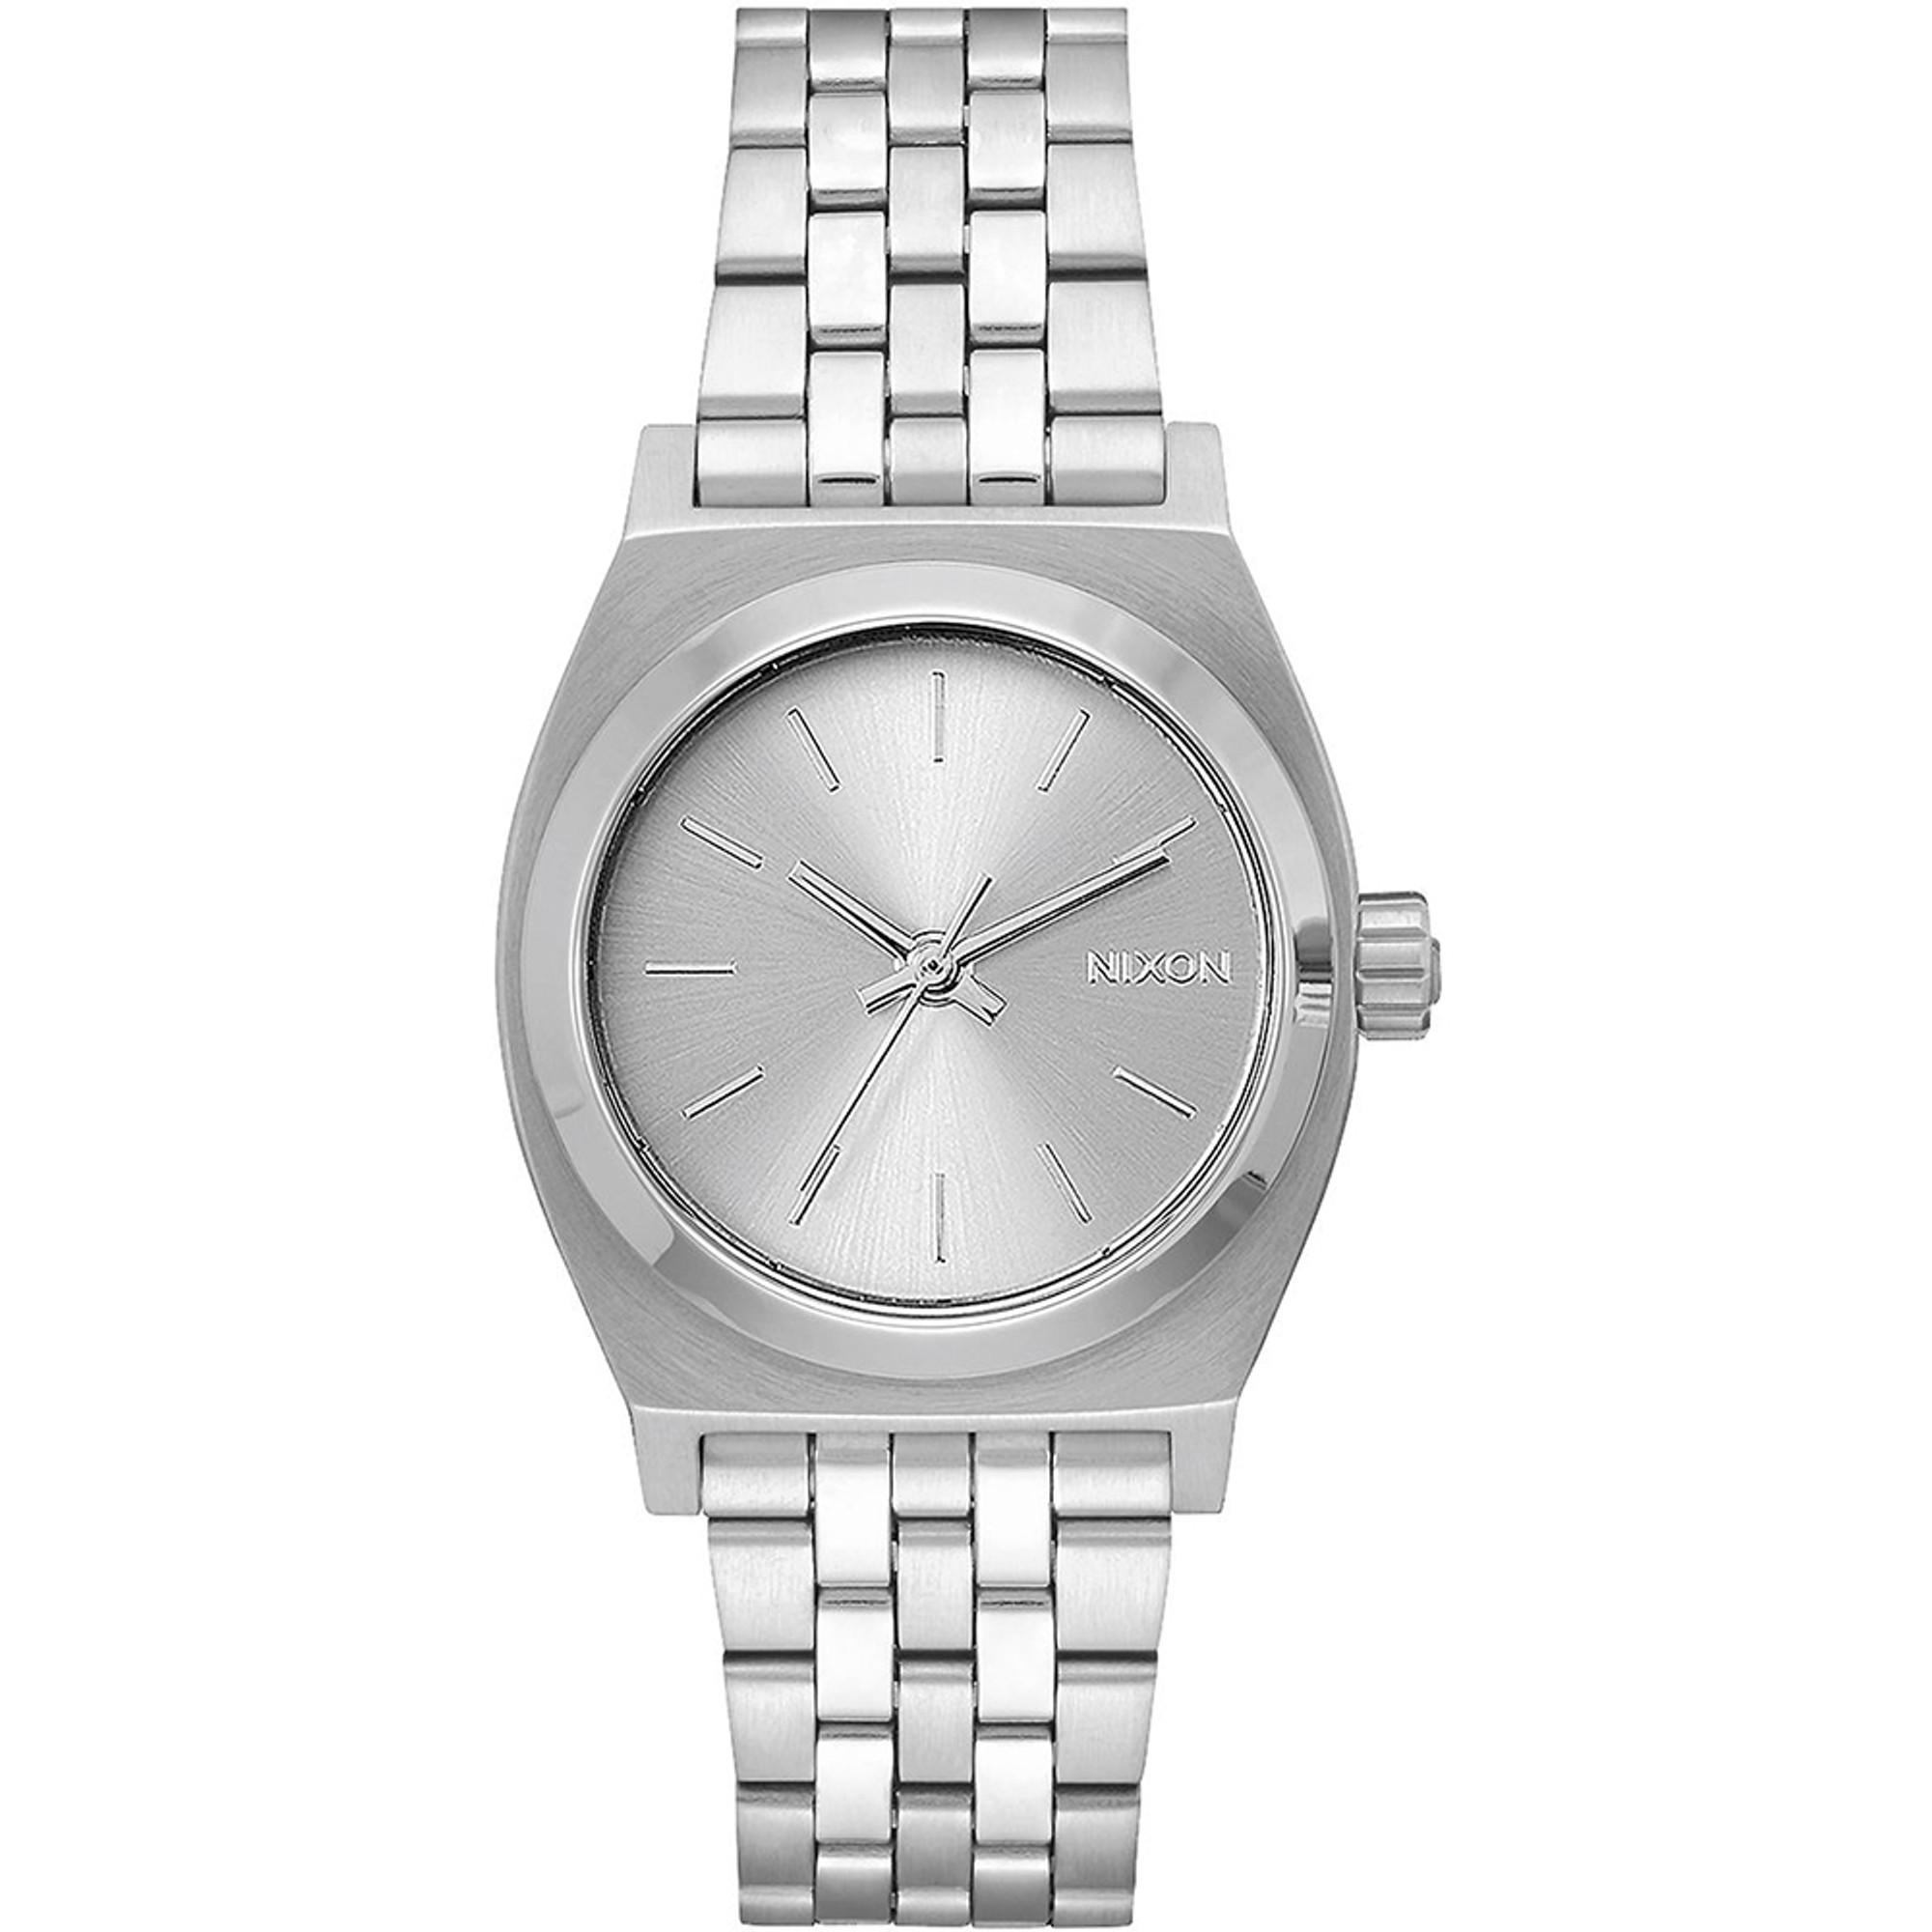 NIXON Time Teller Medium A1130-1920-00